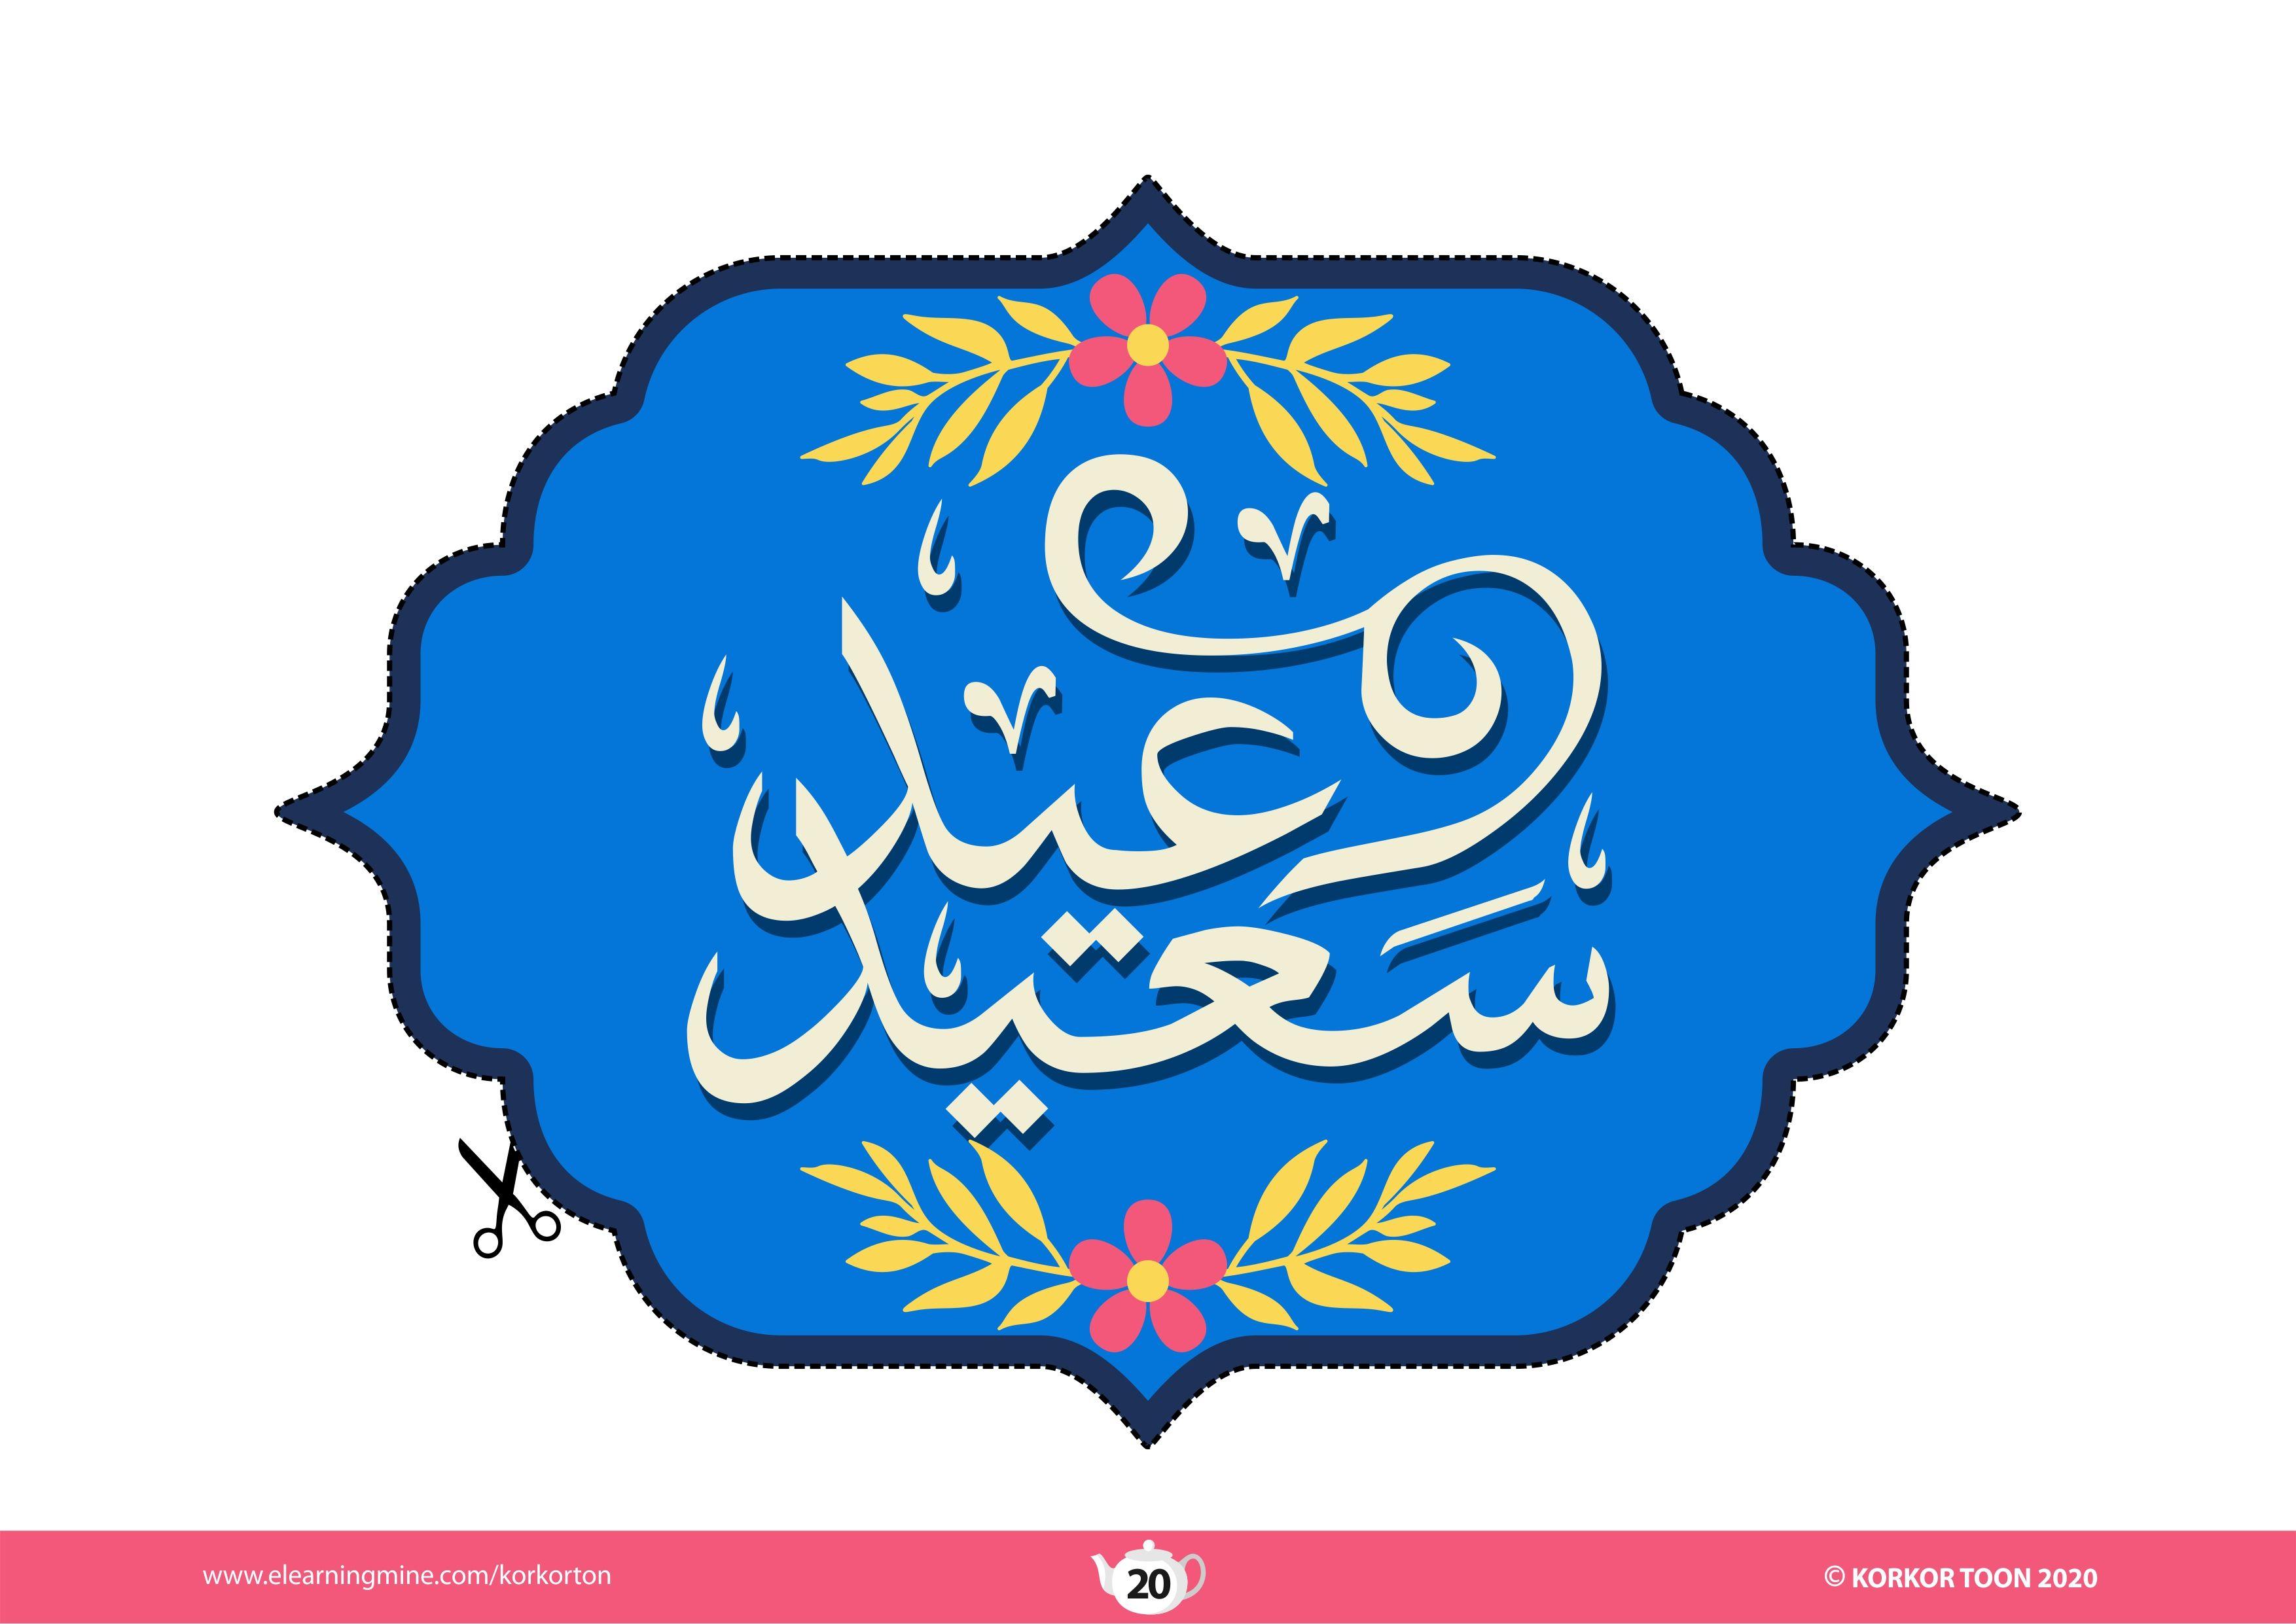 Printable Eid Decoration زينة العيد للطباعة Eid Gifts Eid Decoration Eid